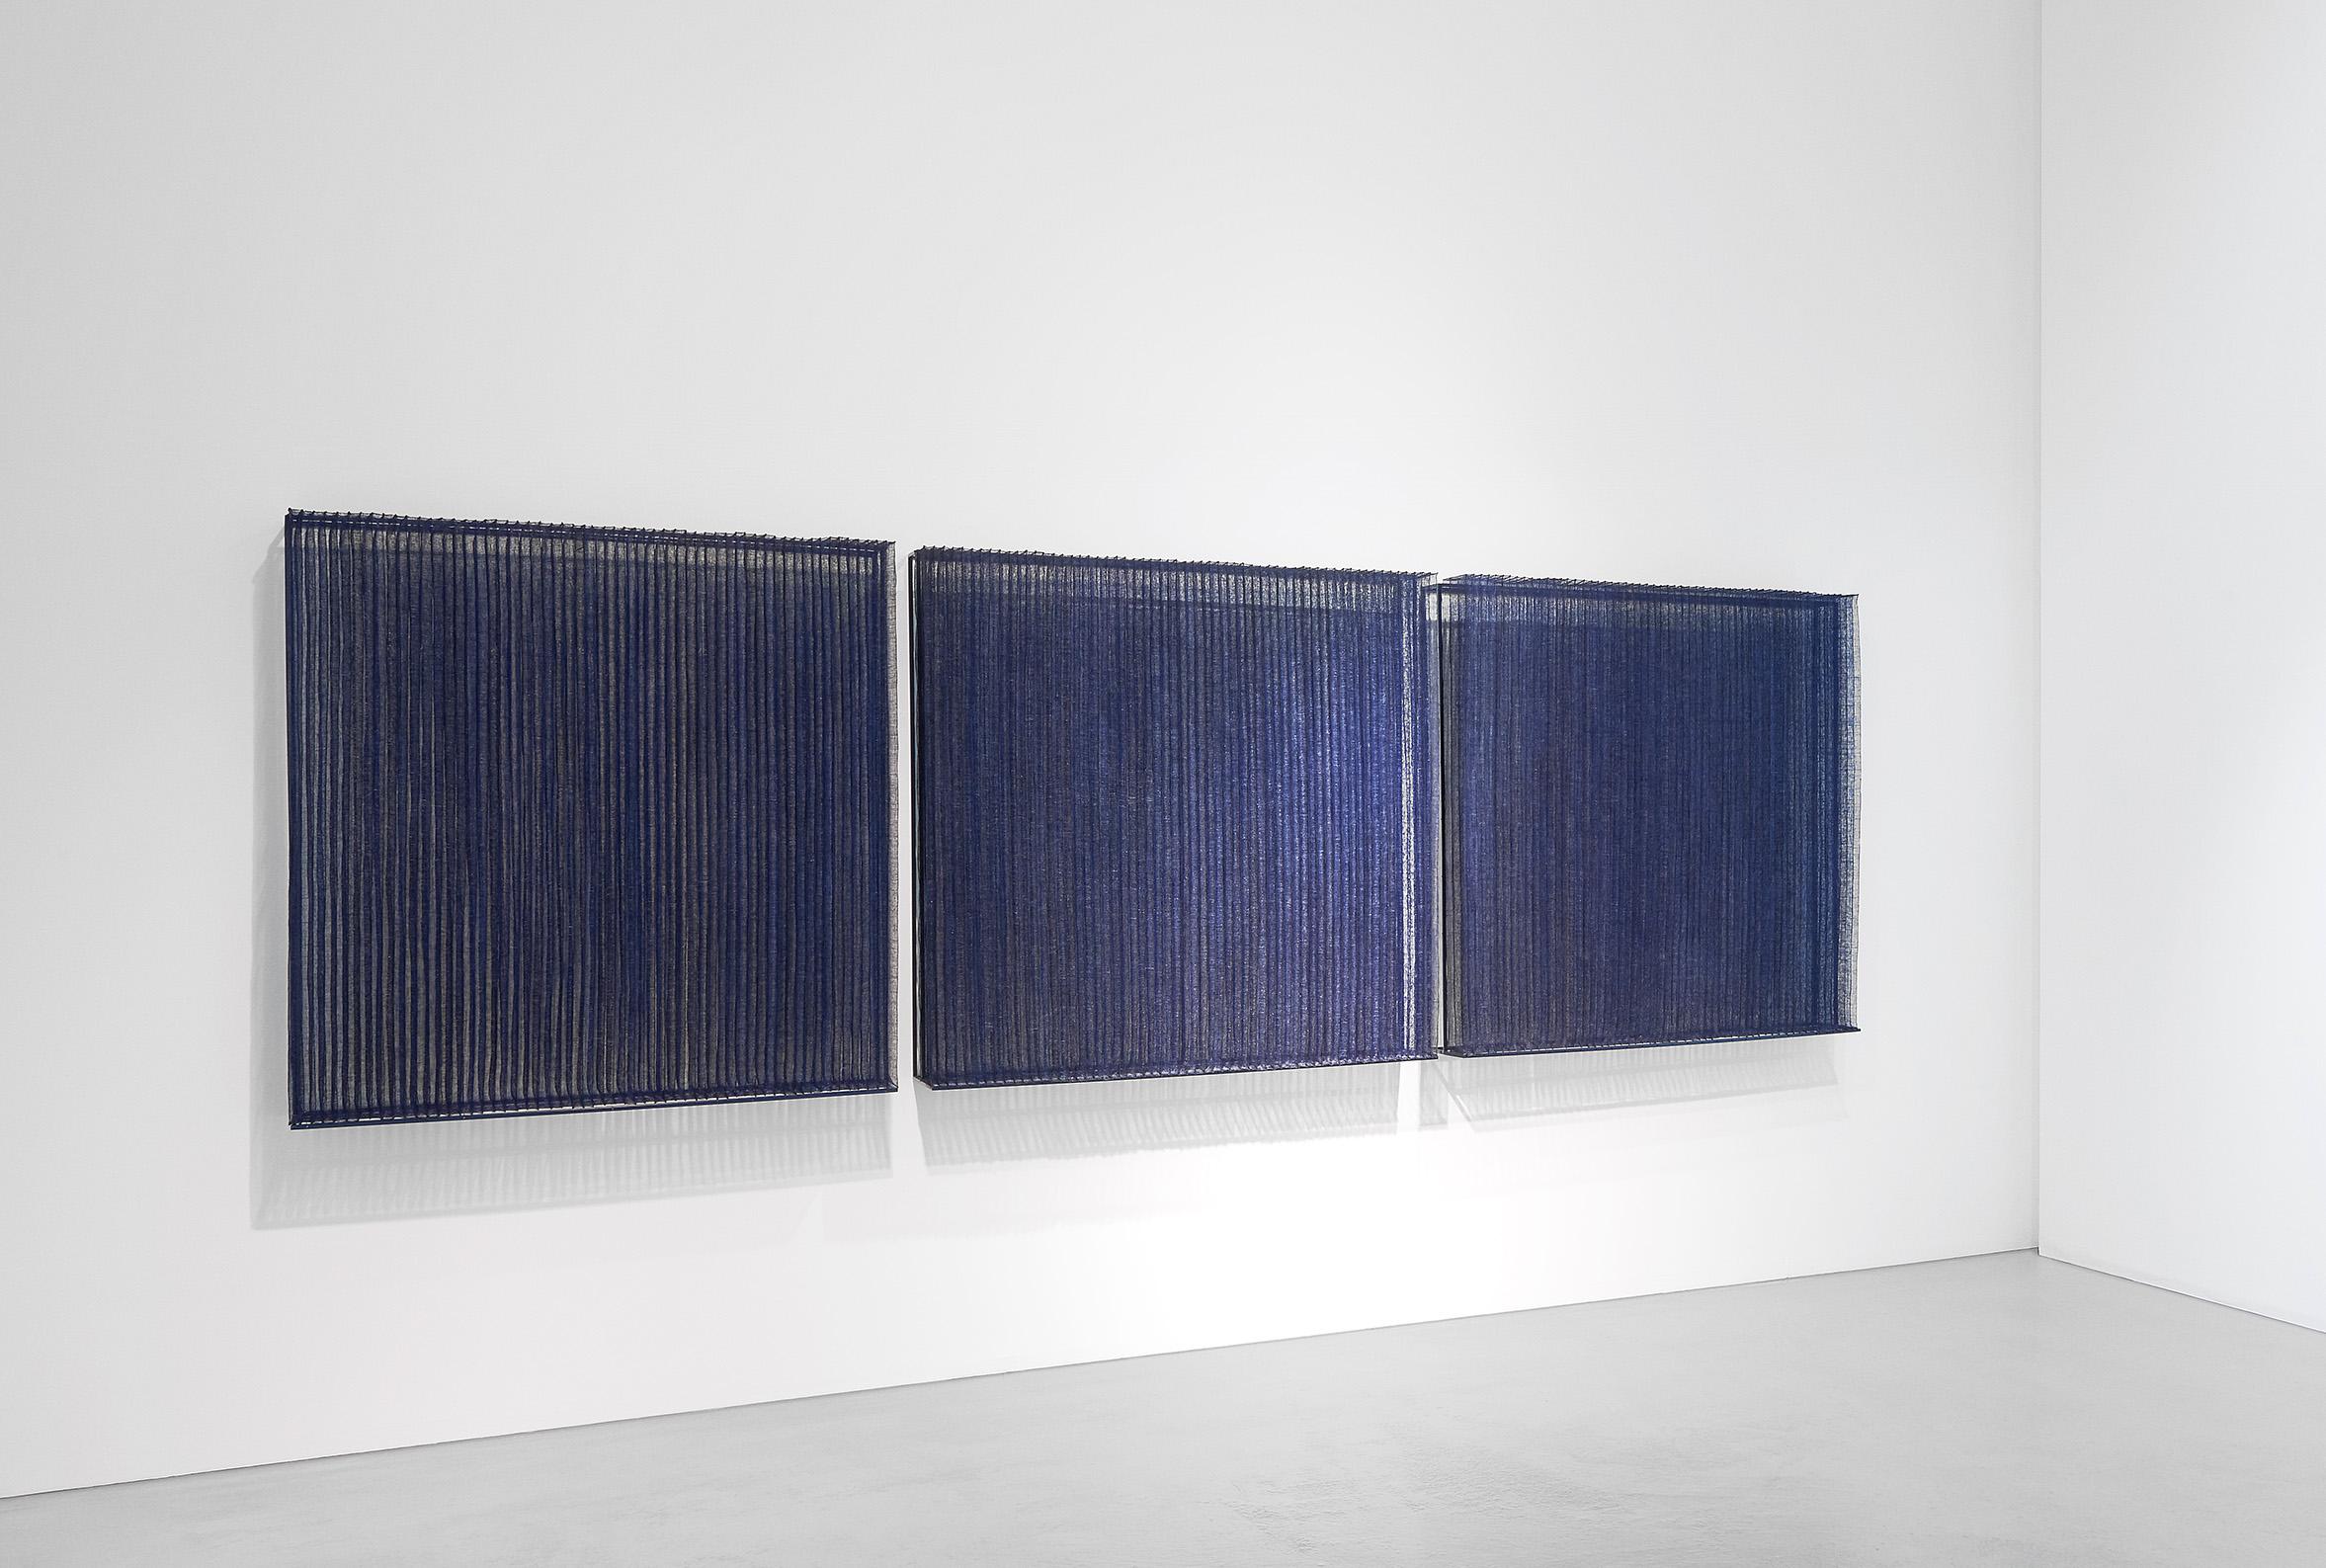 "Yeonsoon Chang, Republic of Korea ""Matrix III Time, Space, Human – 1,2,3"", abaca fiber, dimensions variable (2016)"